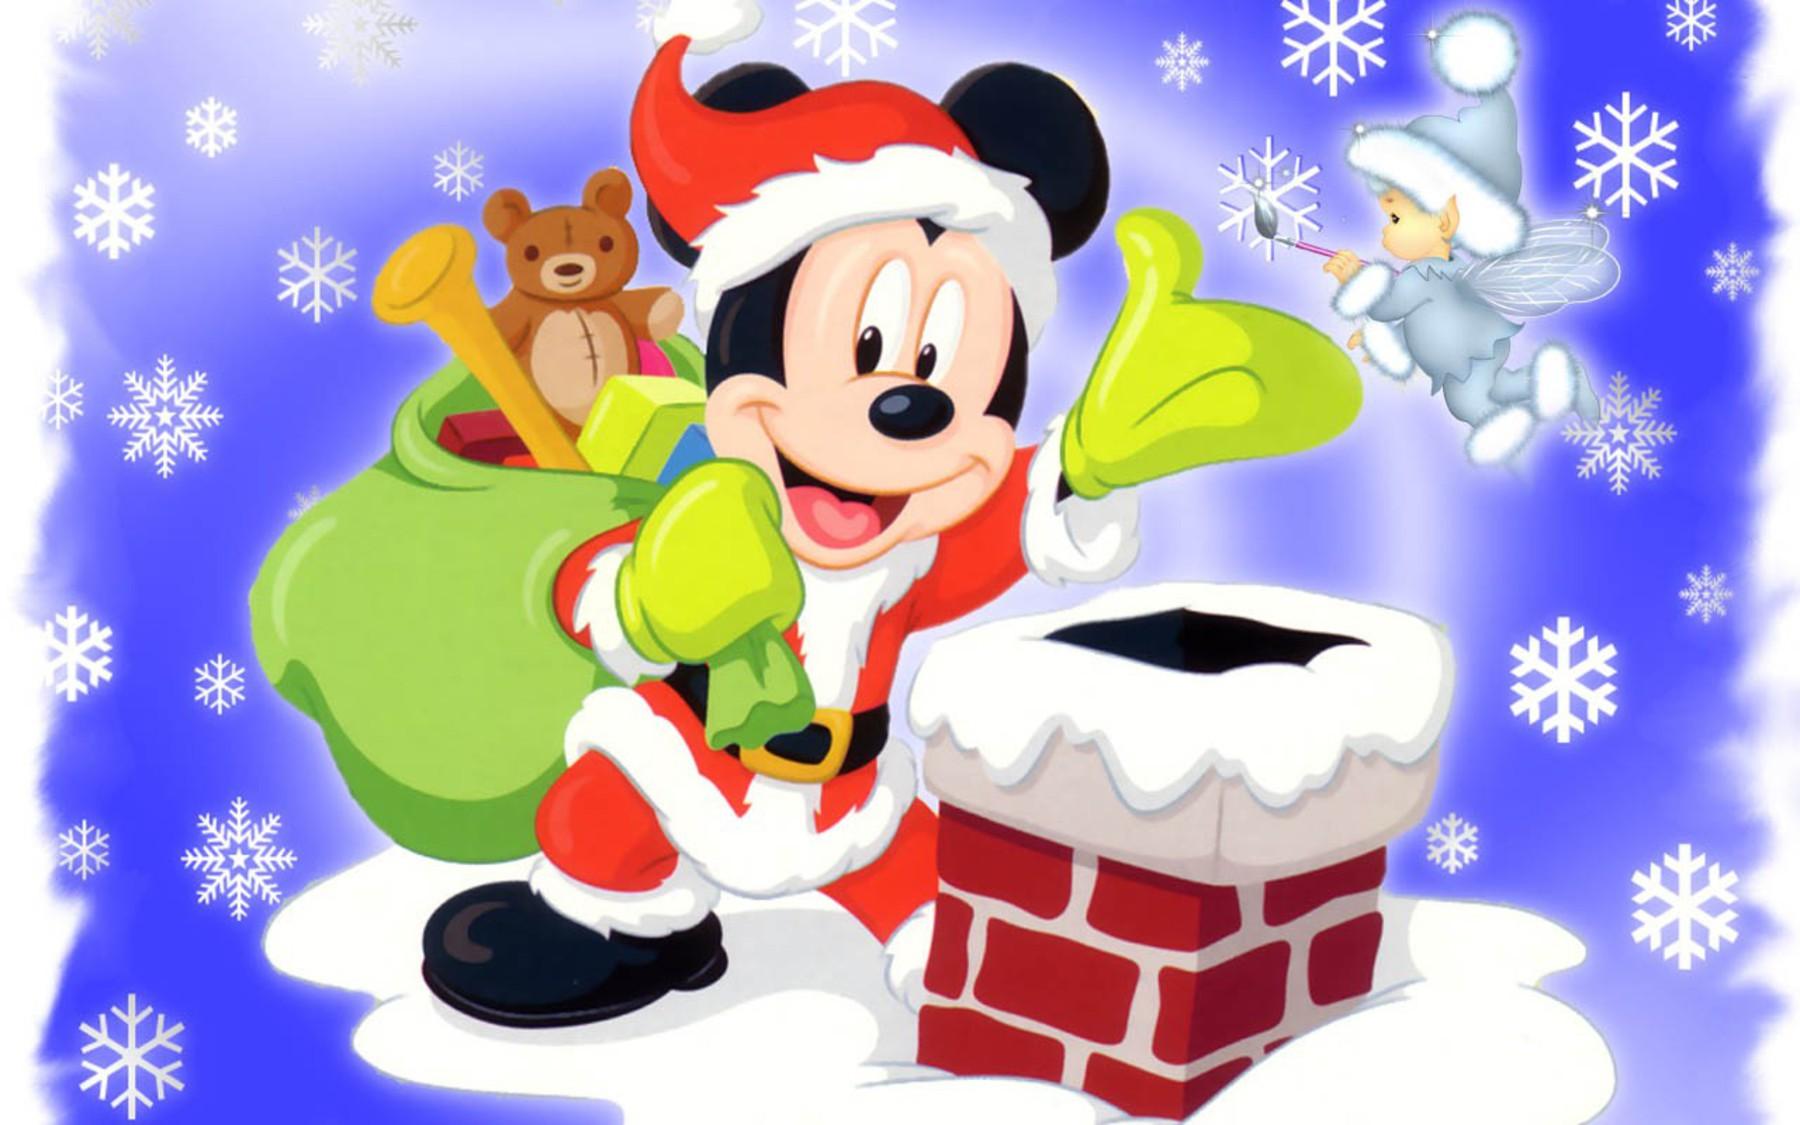 Cute Disney Christmas Wallpaper wallpaper Wallpapers   HD Wallpapers 1800x1125